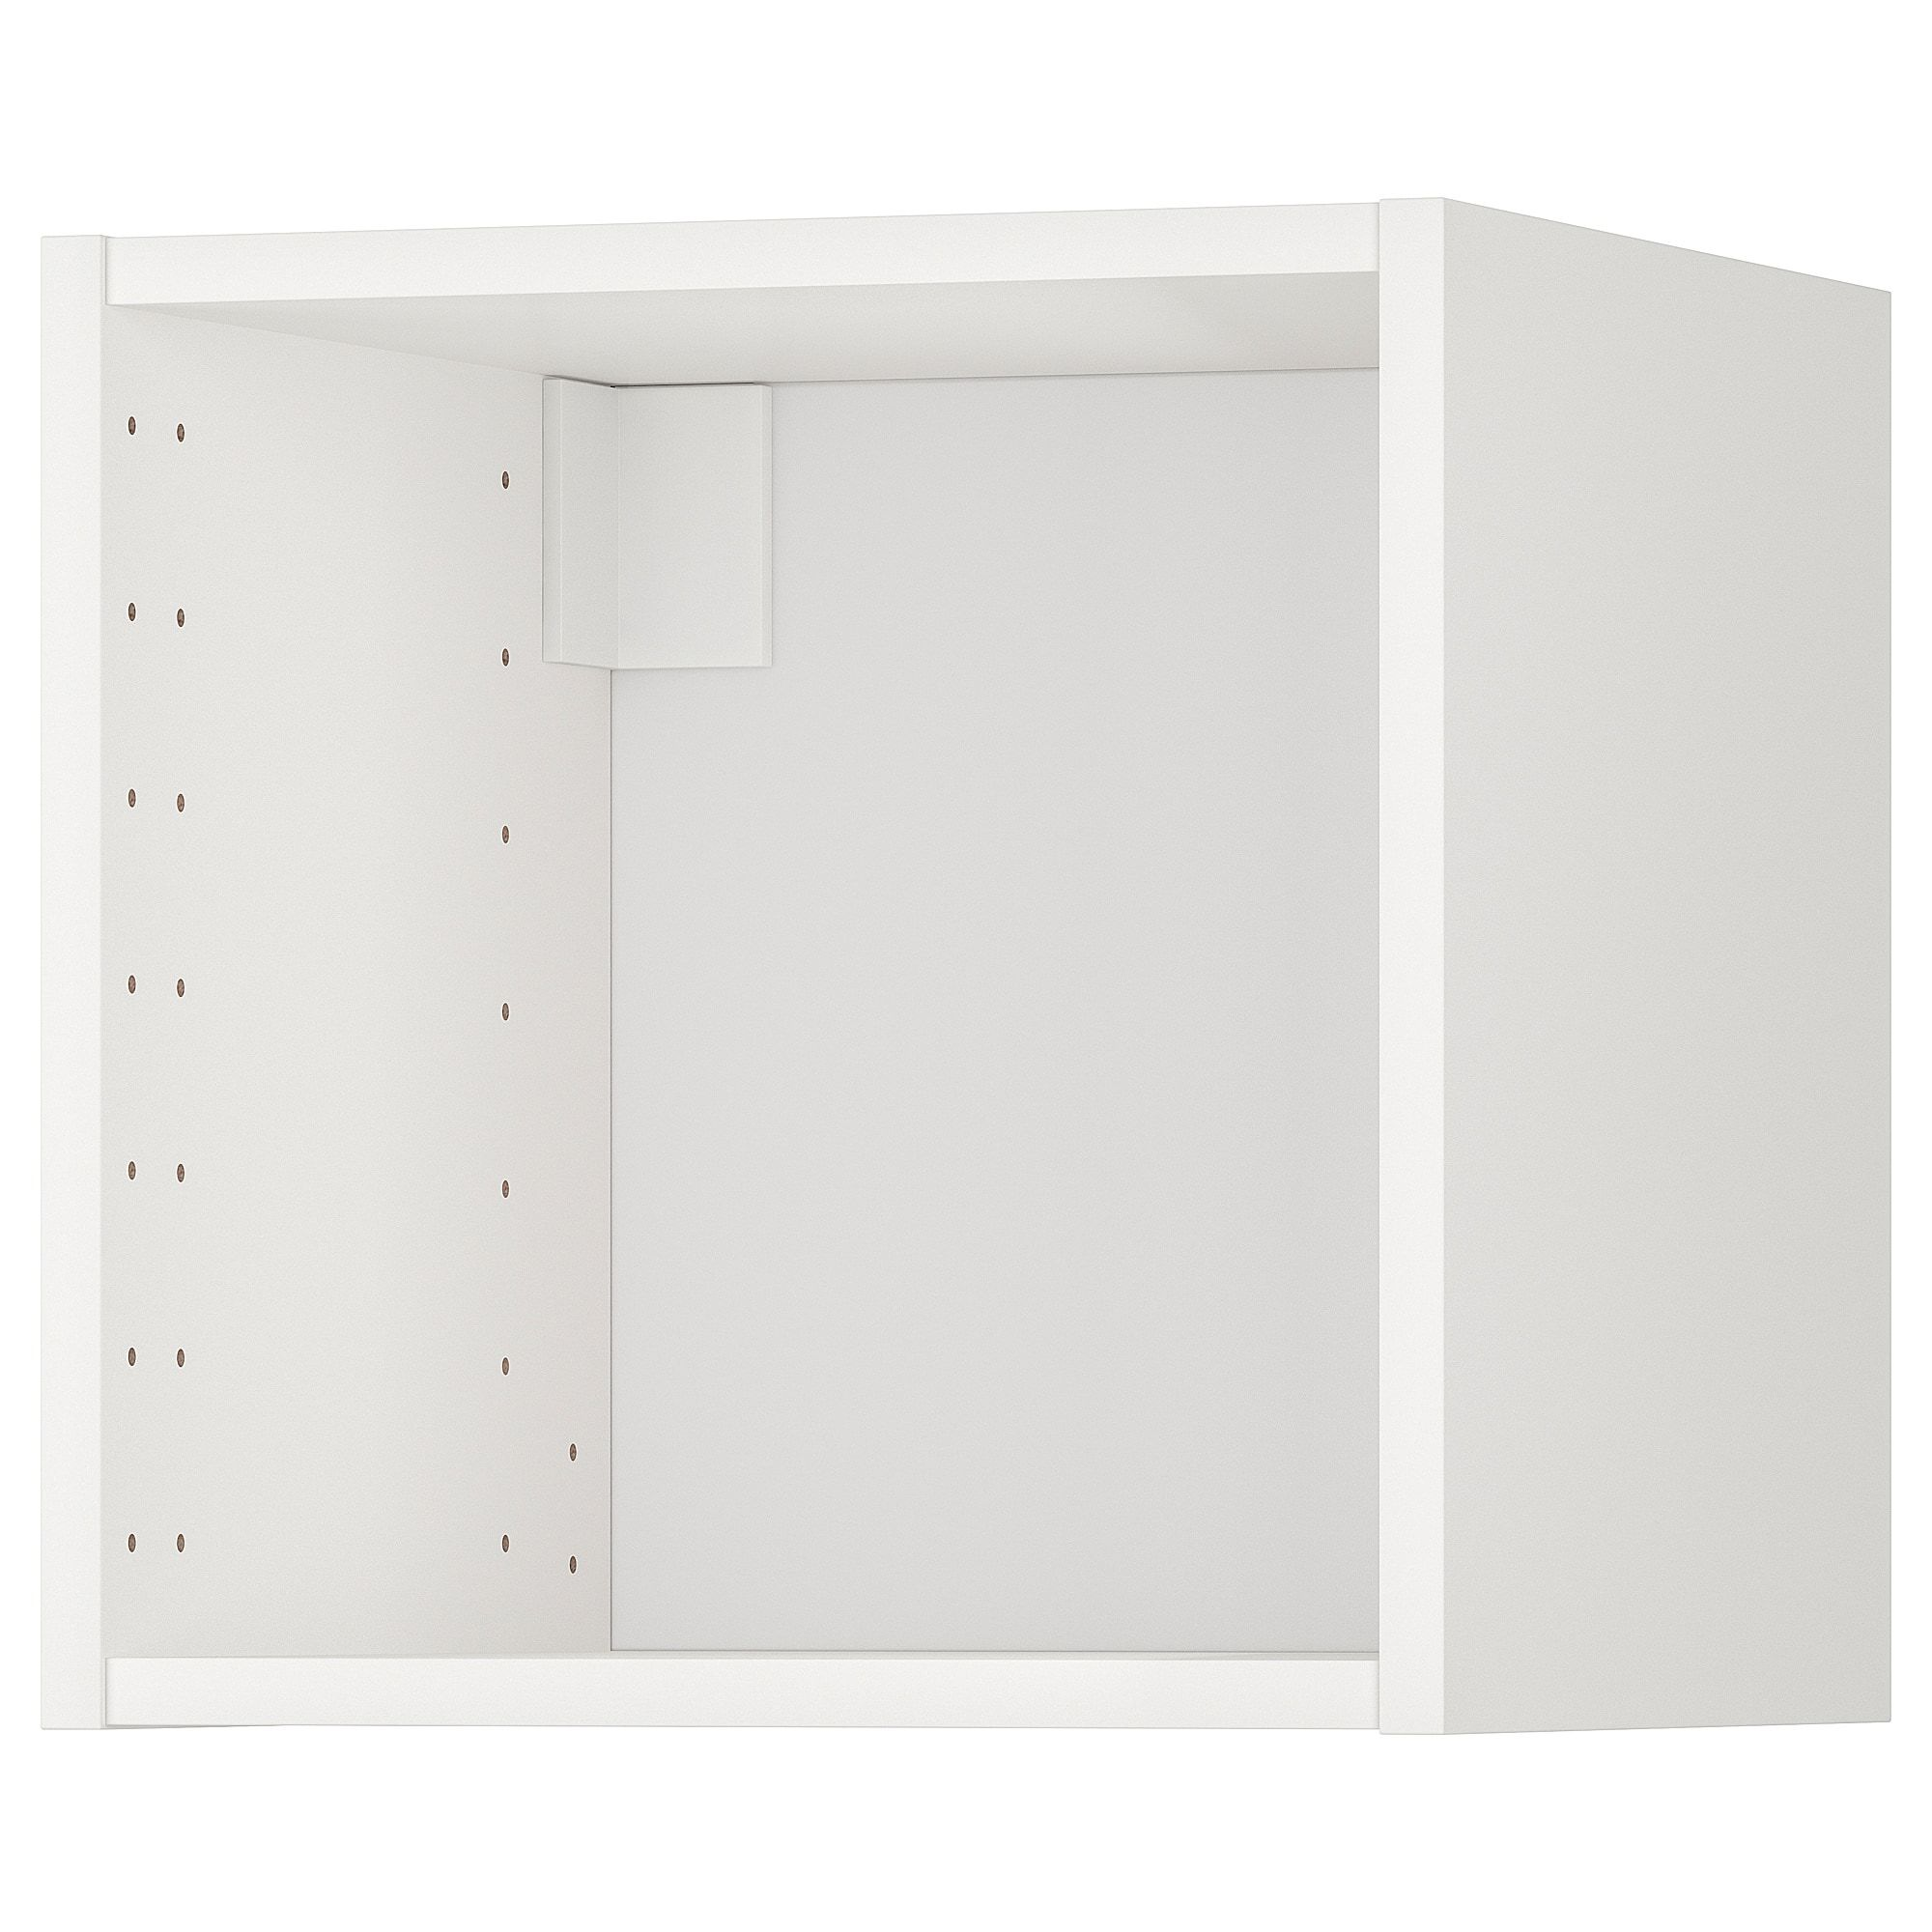 Metod Structure Element Mural Blanc 40x37x40 Cm Ikea En 2020 Armoire Murale Ikea Rangement Mural